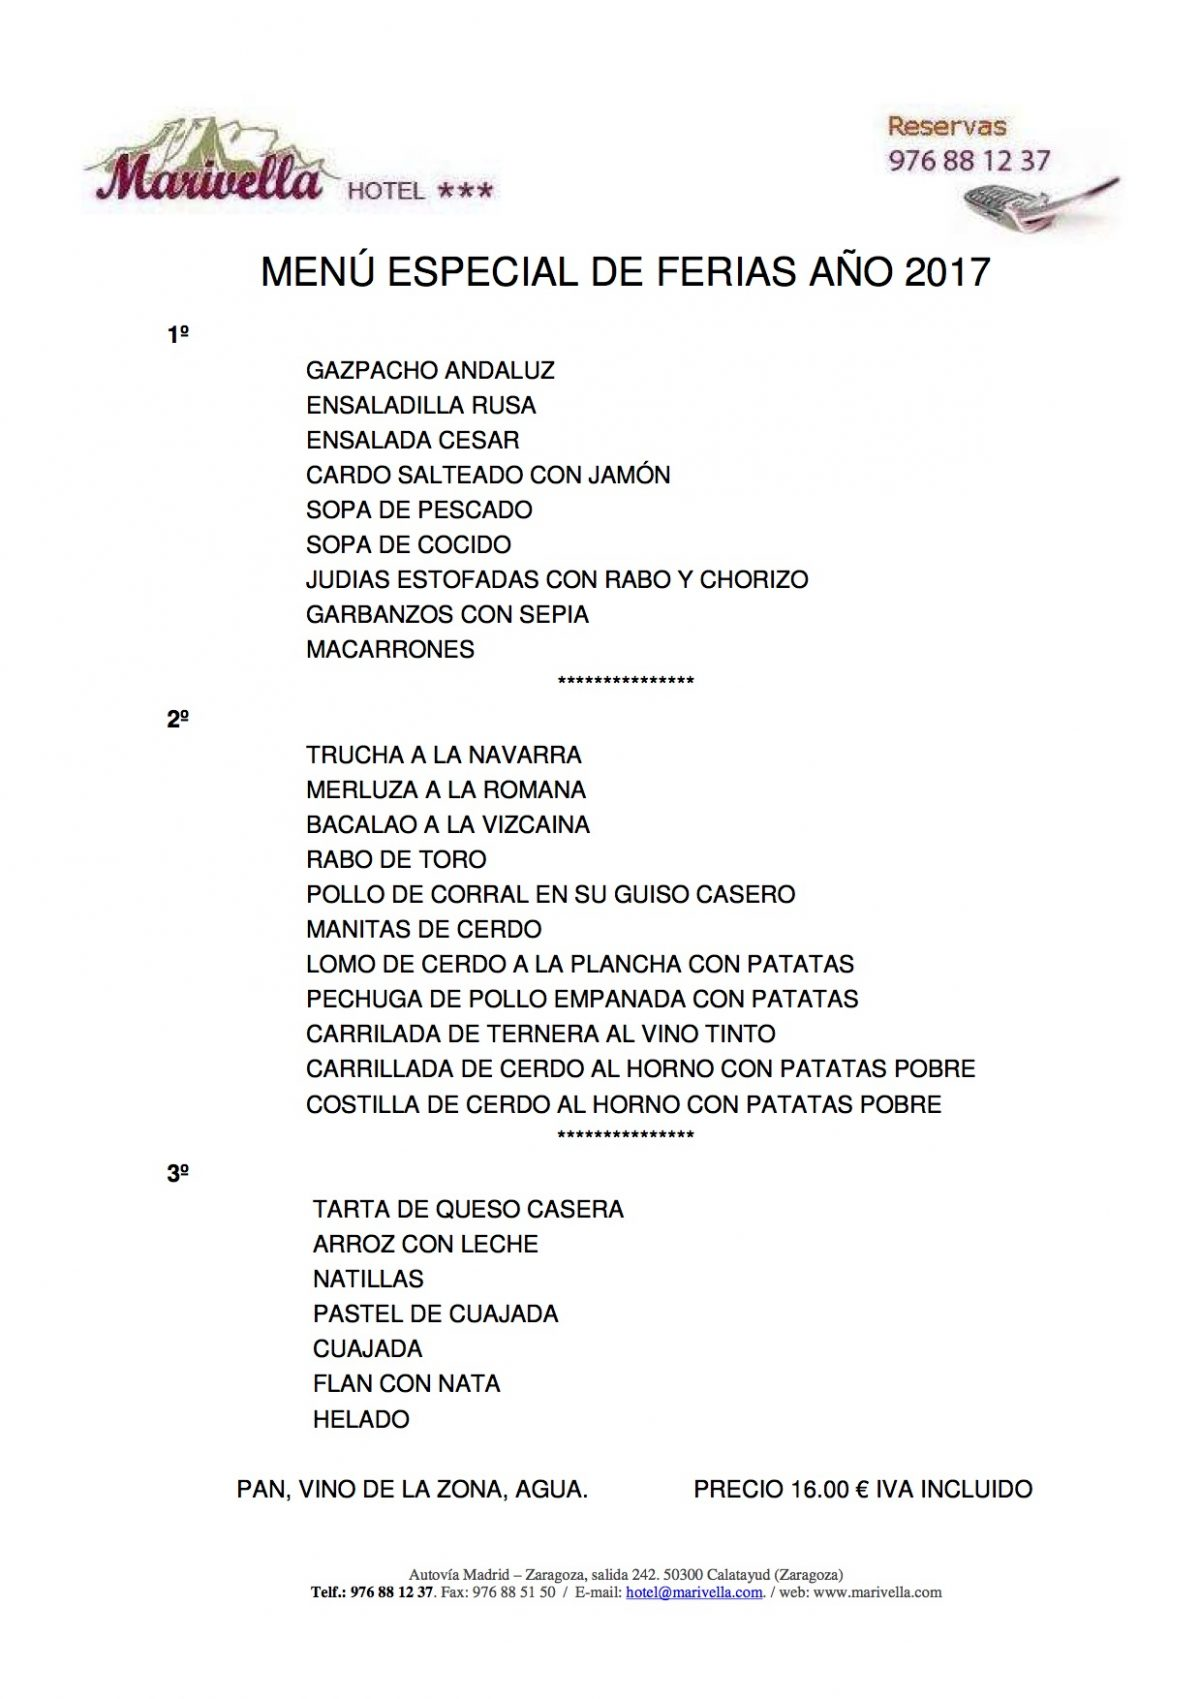 MENU-ESPECIAL-DE-FERIAS-MARIVELLA-2017-1200x1699.jpg